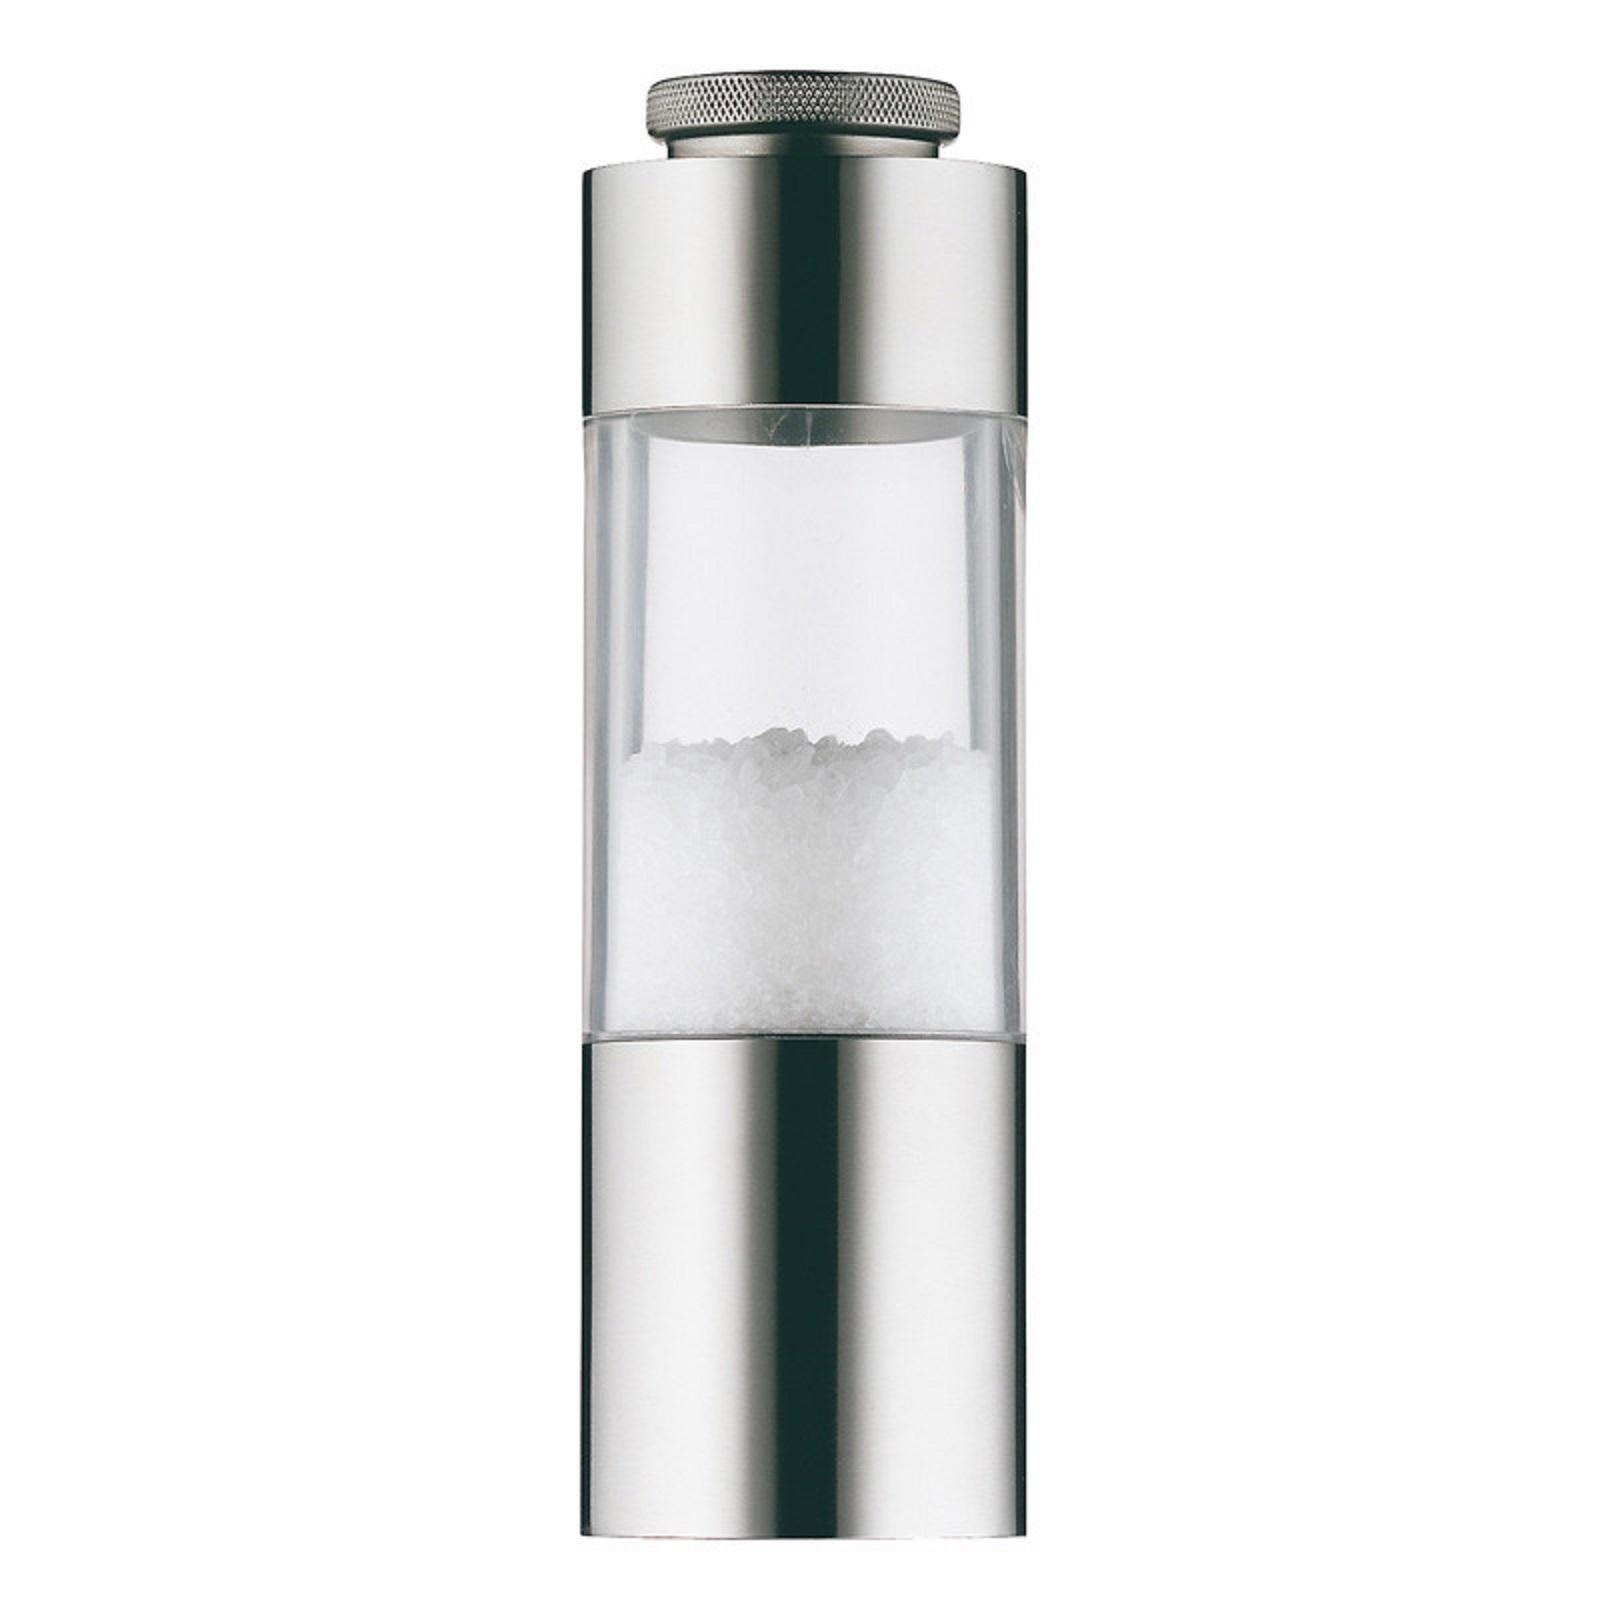 Онлайн каталог PROMENU: Мельница для соли WMF CERAMILL, высота 16 см, серебристый WMF 06 5467 6040